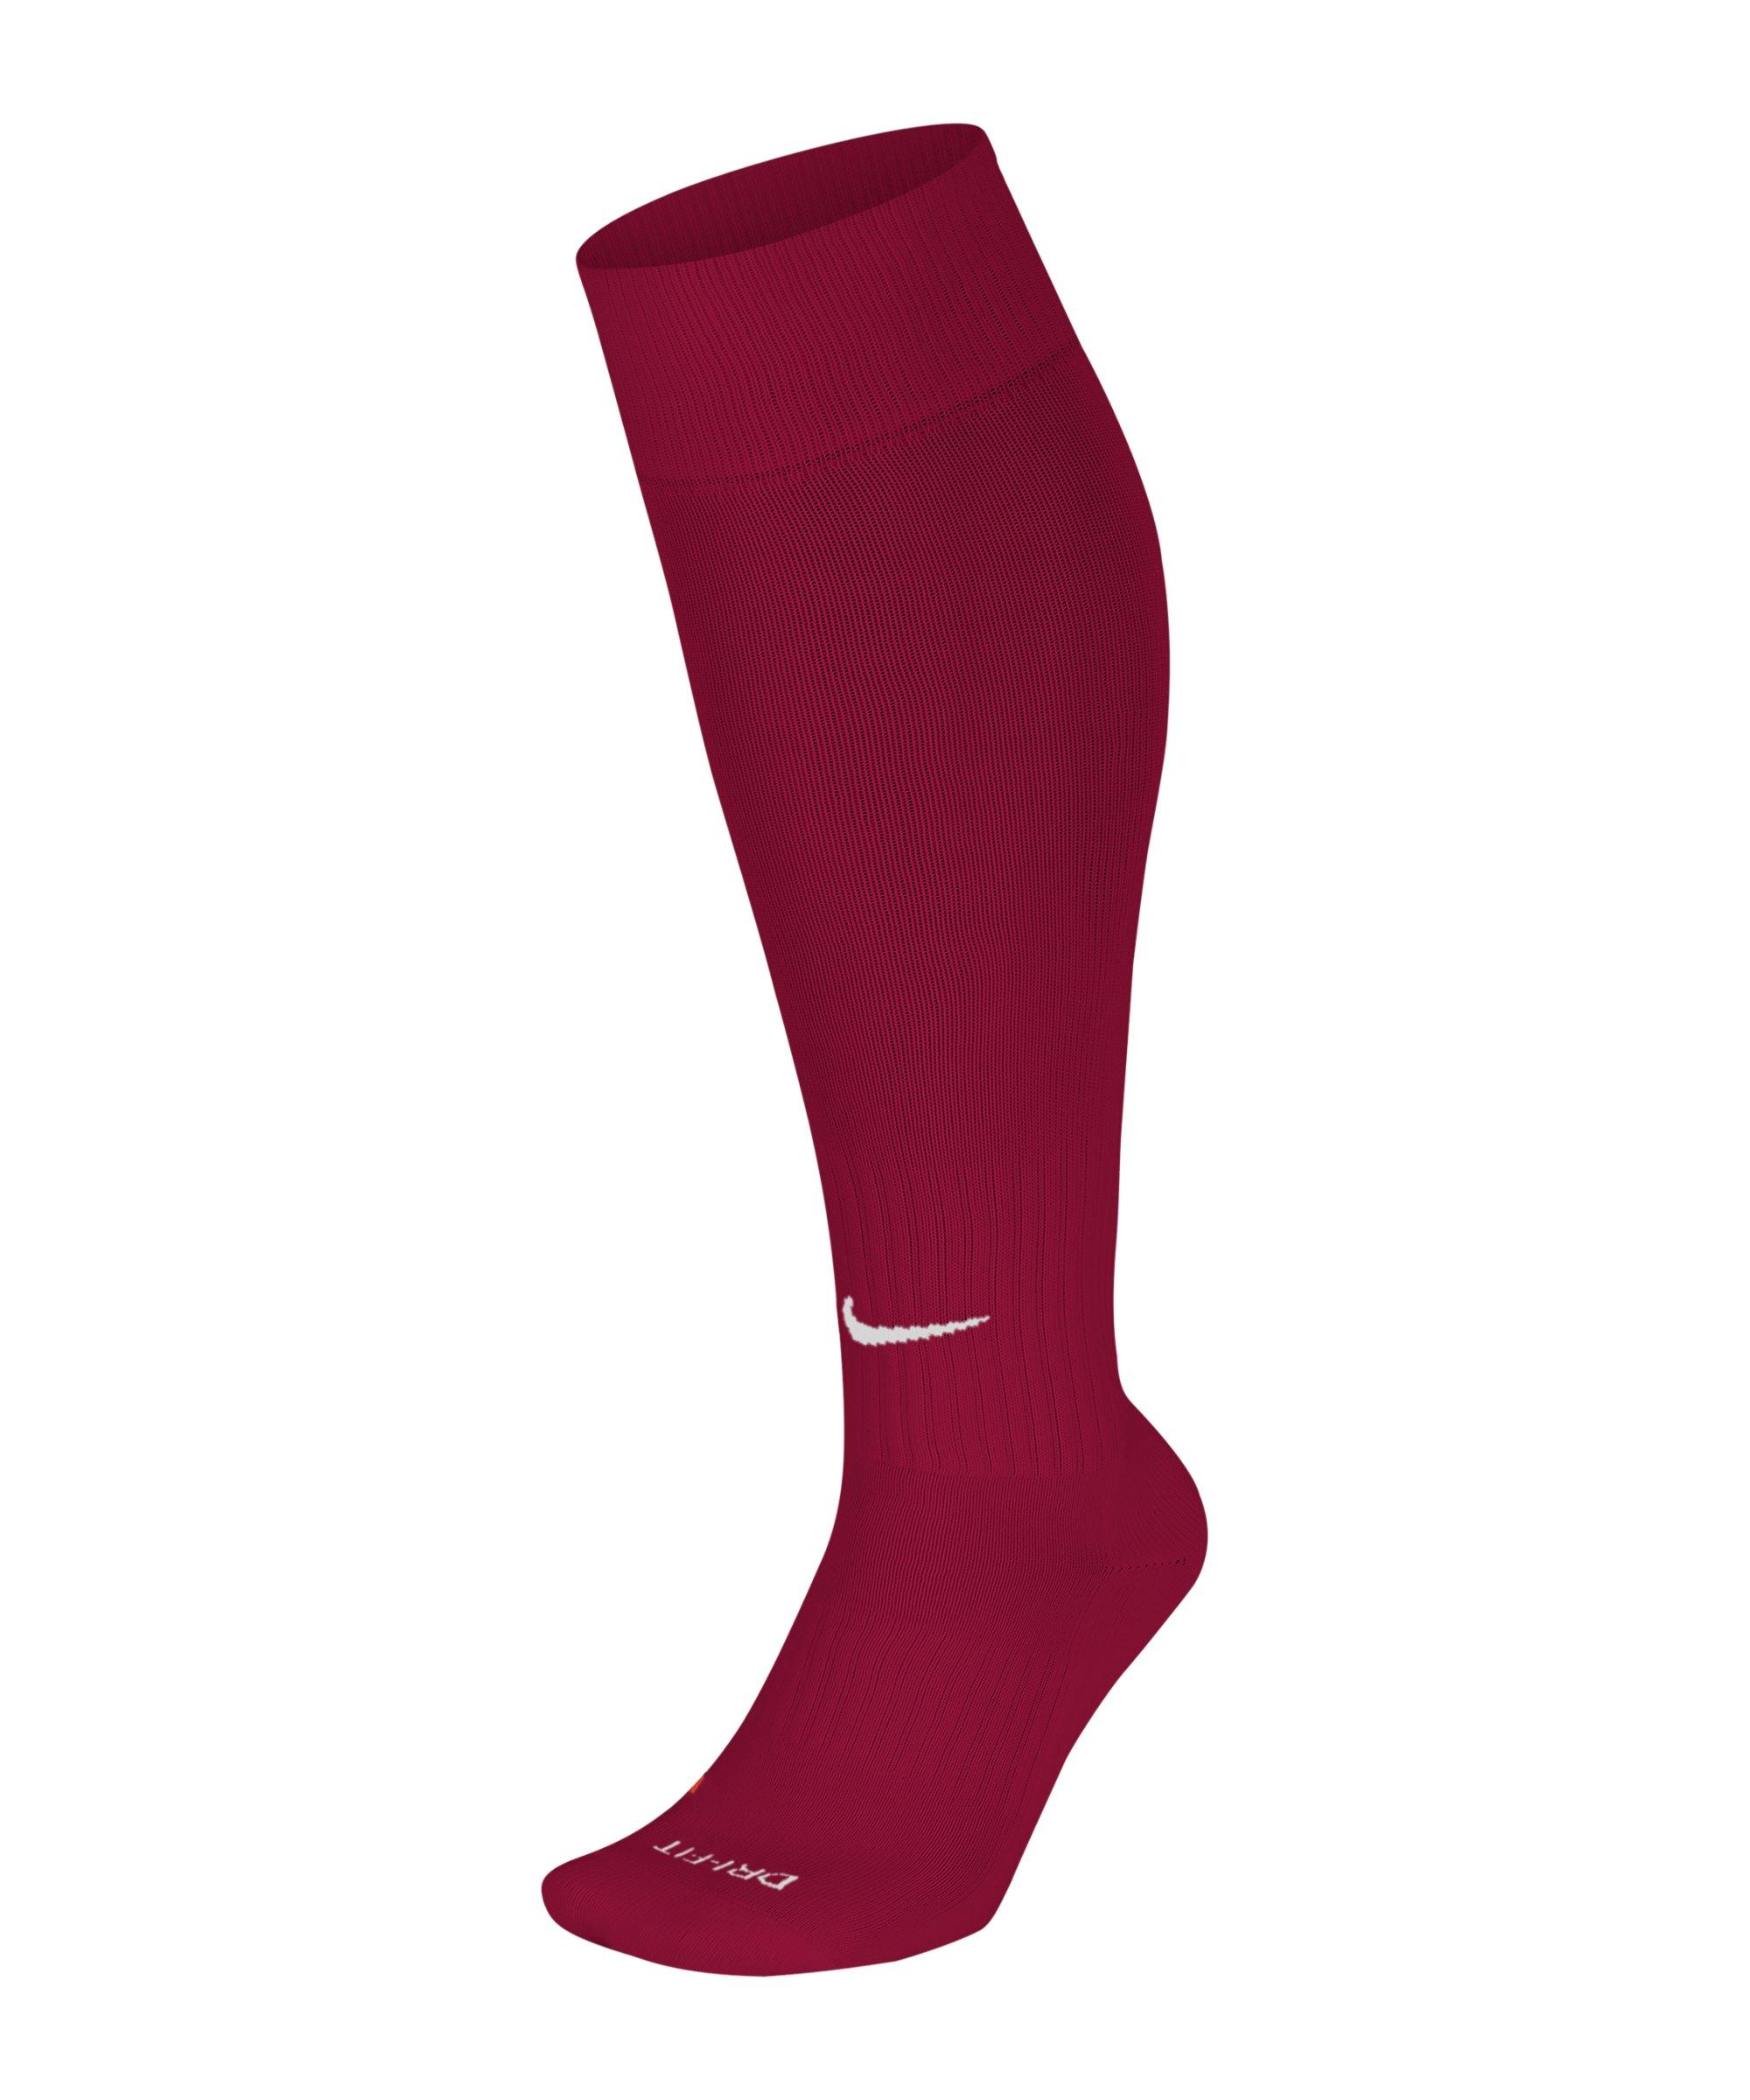 Nike Academy OVC Stutzenstrumpf Rot F671 - rot